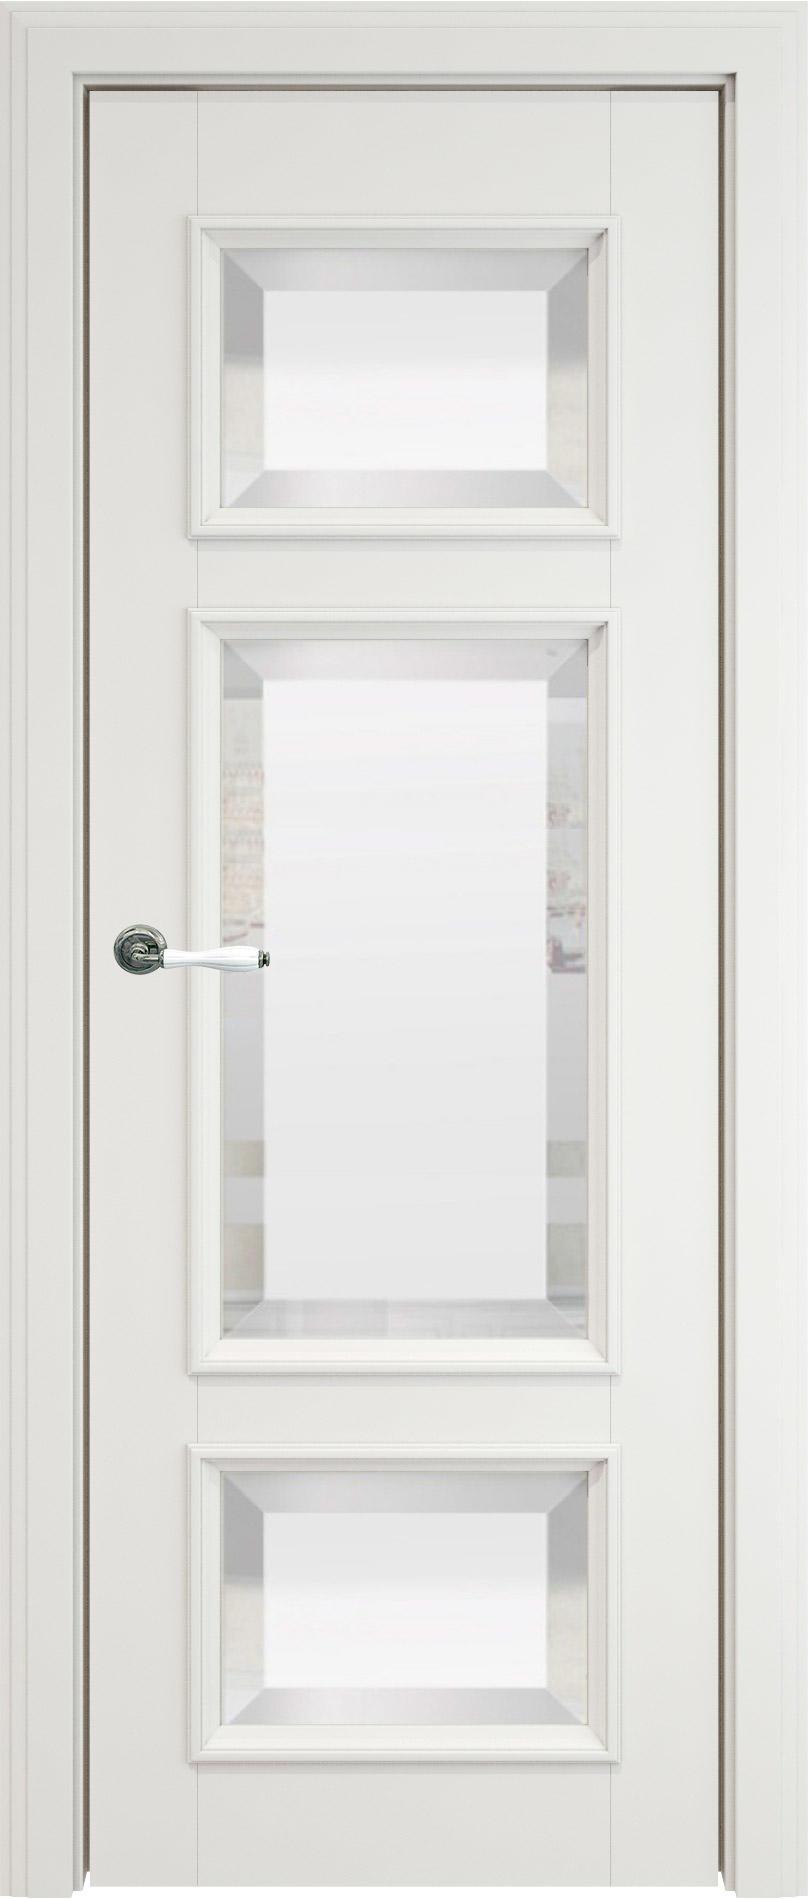 Siena LUX цвет - Белая эмаль (RAL 9003) Со стеклом (ДО)